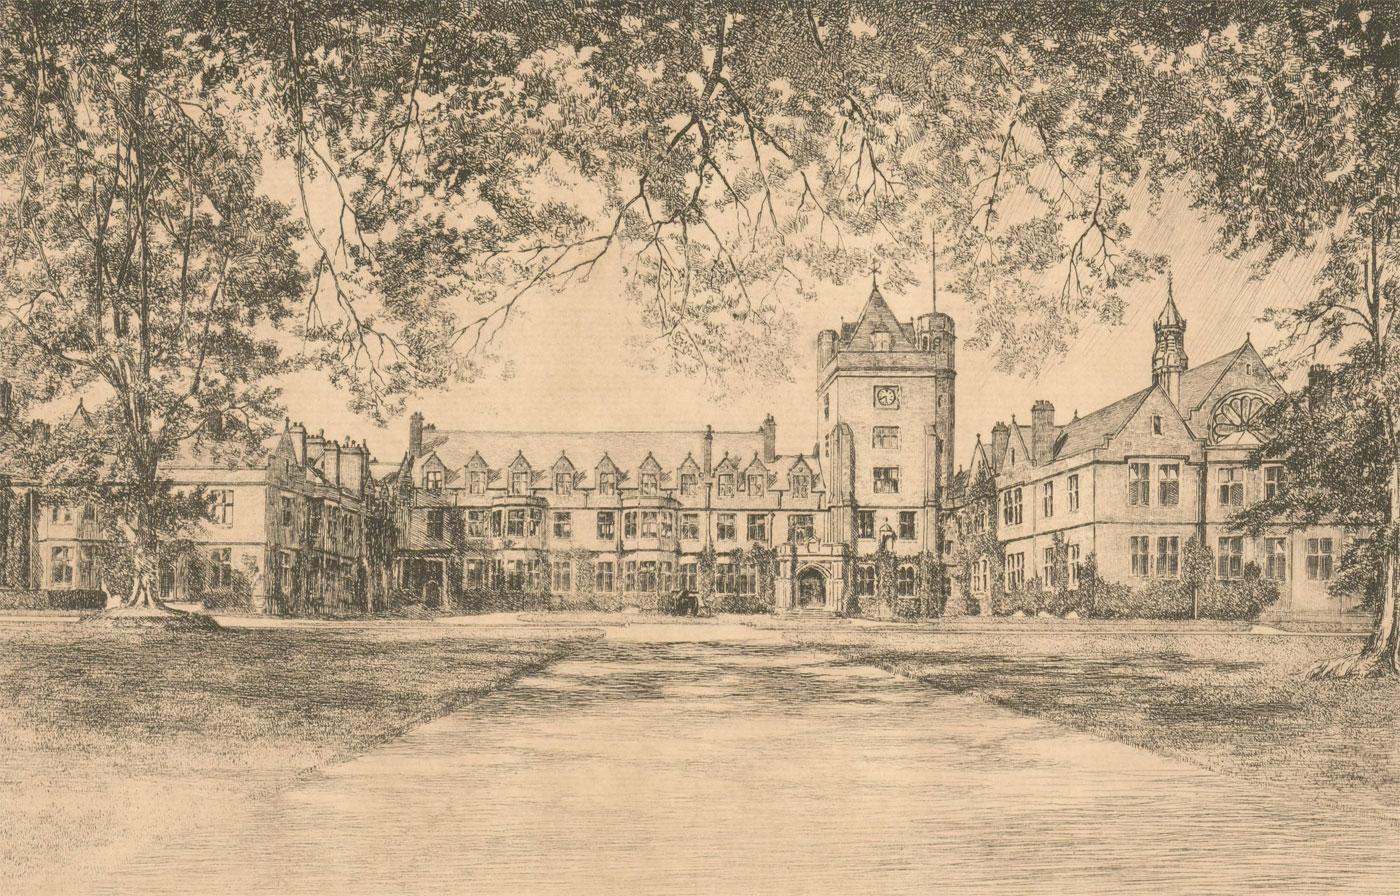 Robert Creswell Boak ARCA (1875-1949) - Etching, Campbell College, Belfast